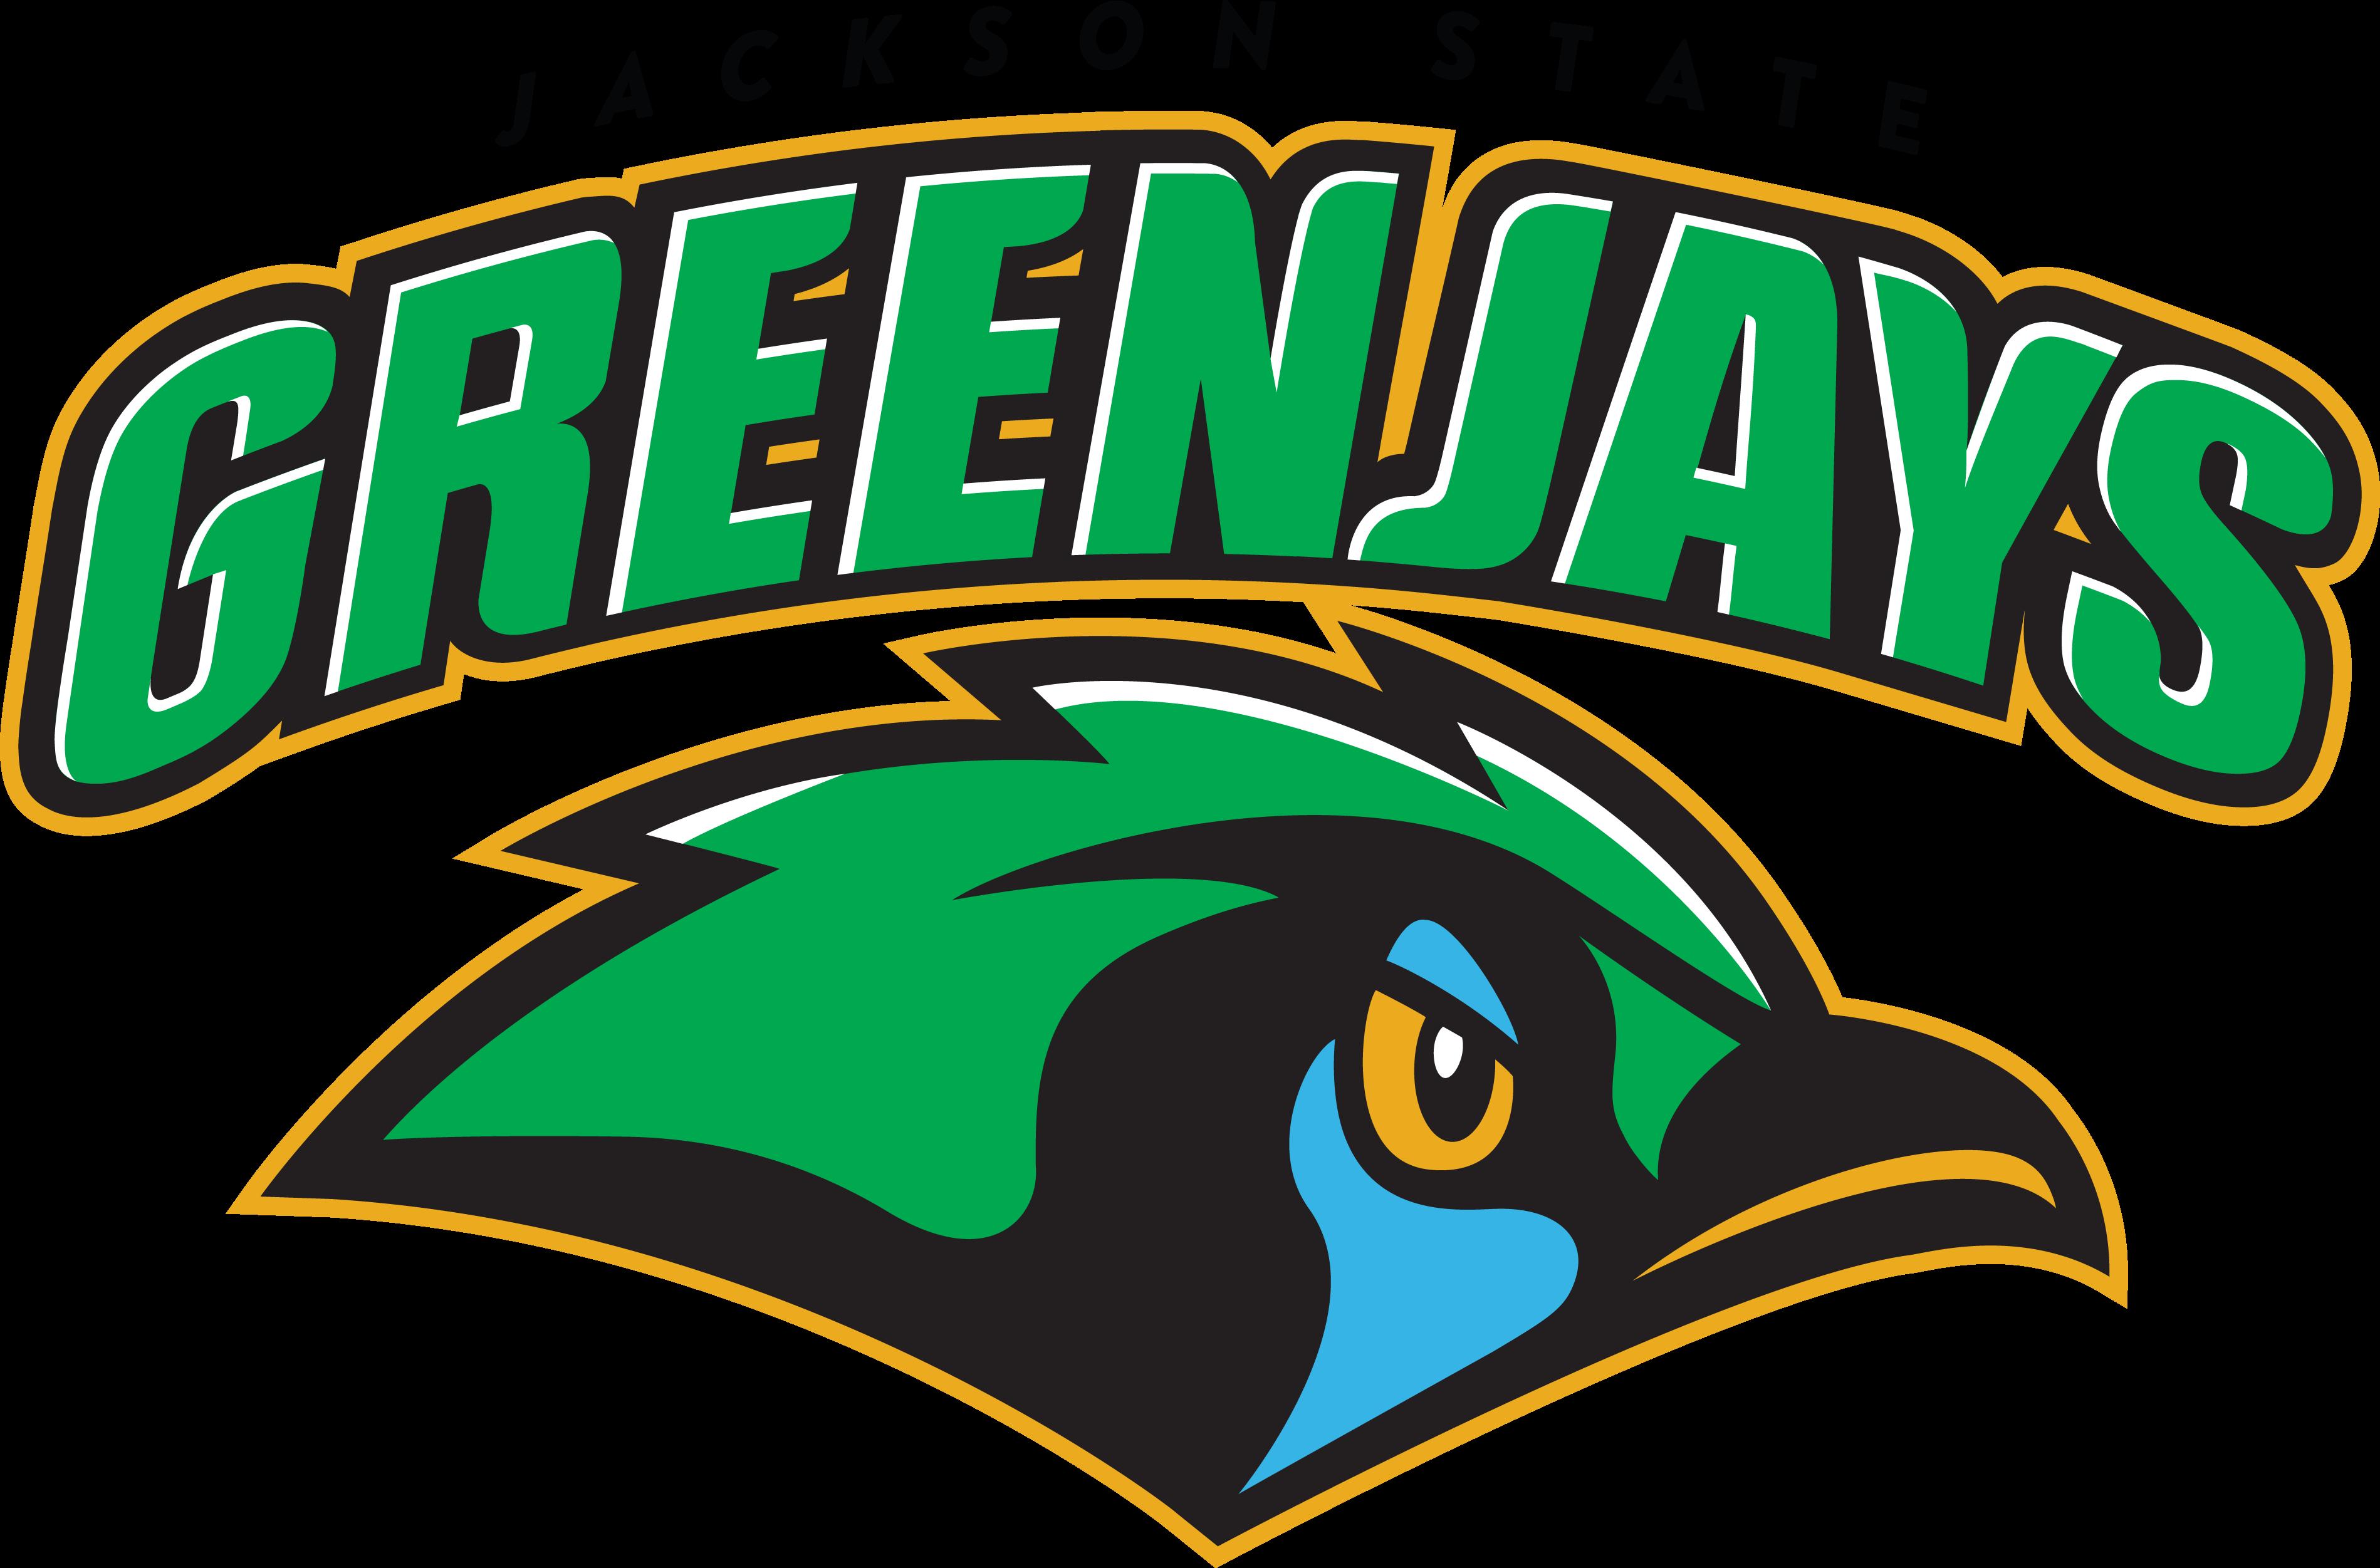 Greenjays logo